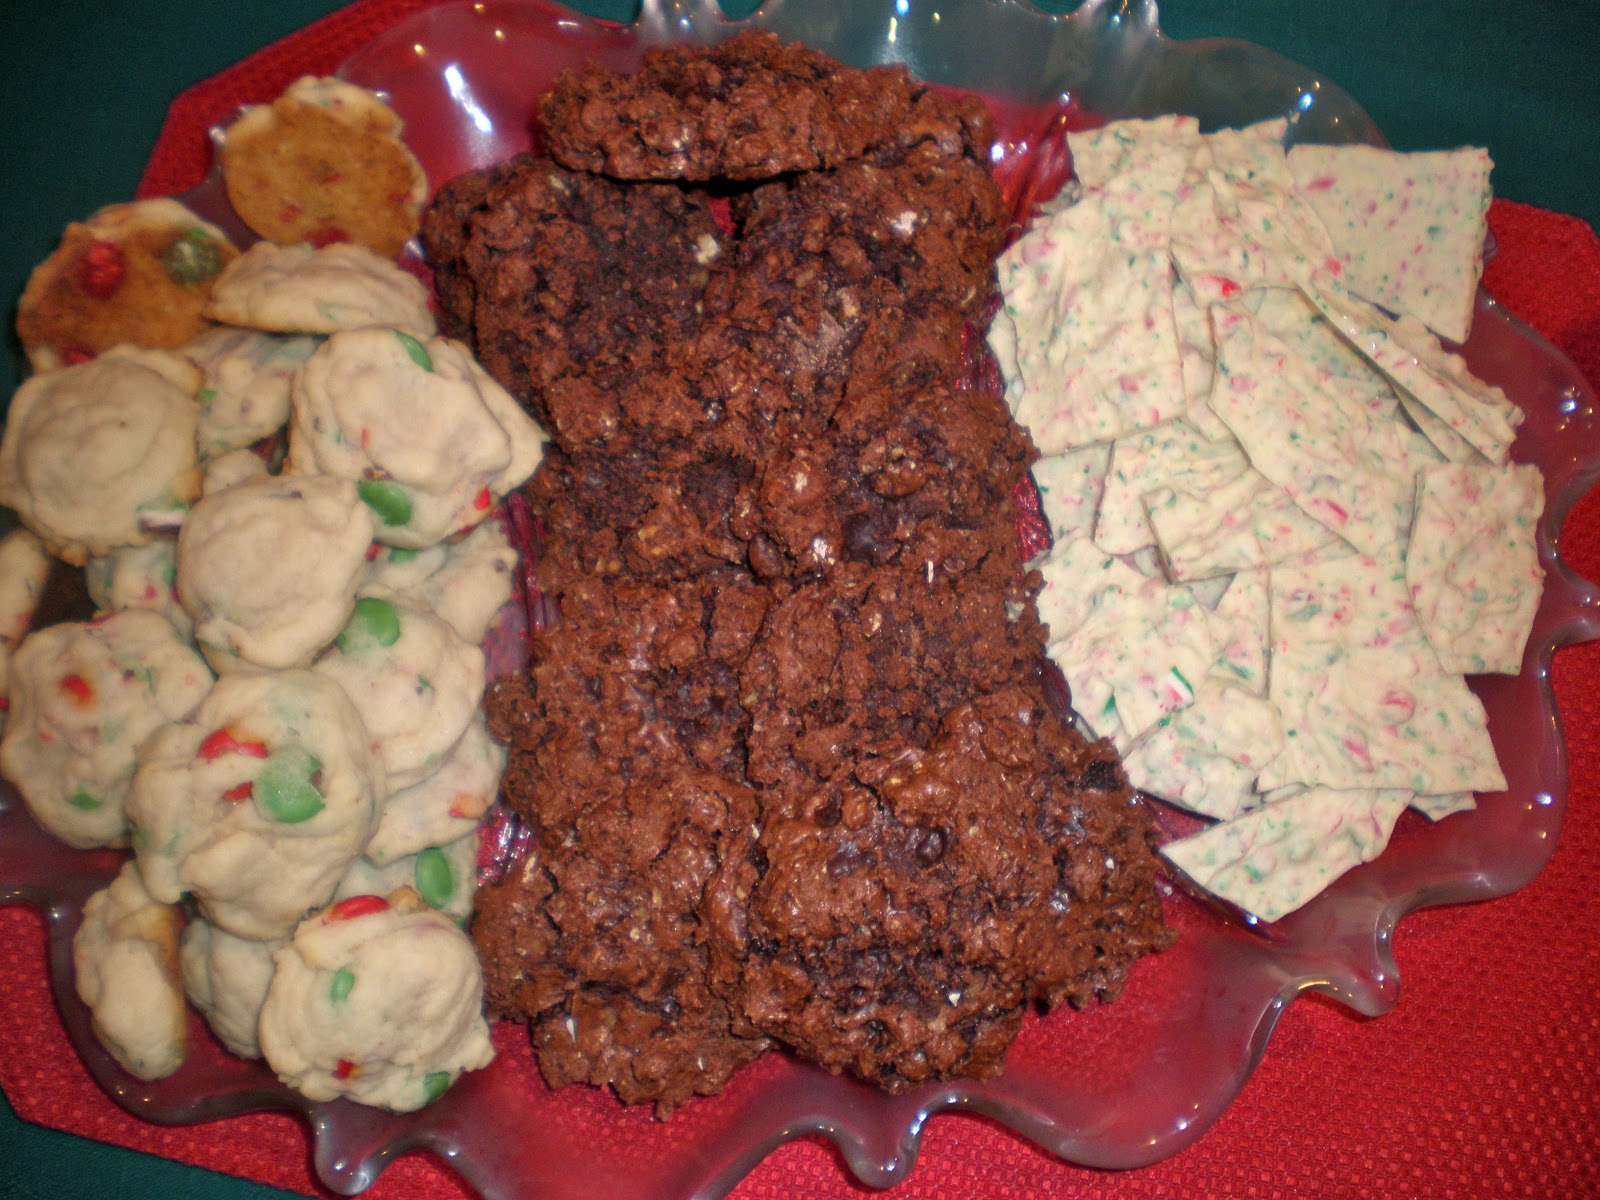 Teacups and Cake: Flourless Chocolate Walnut Cookies